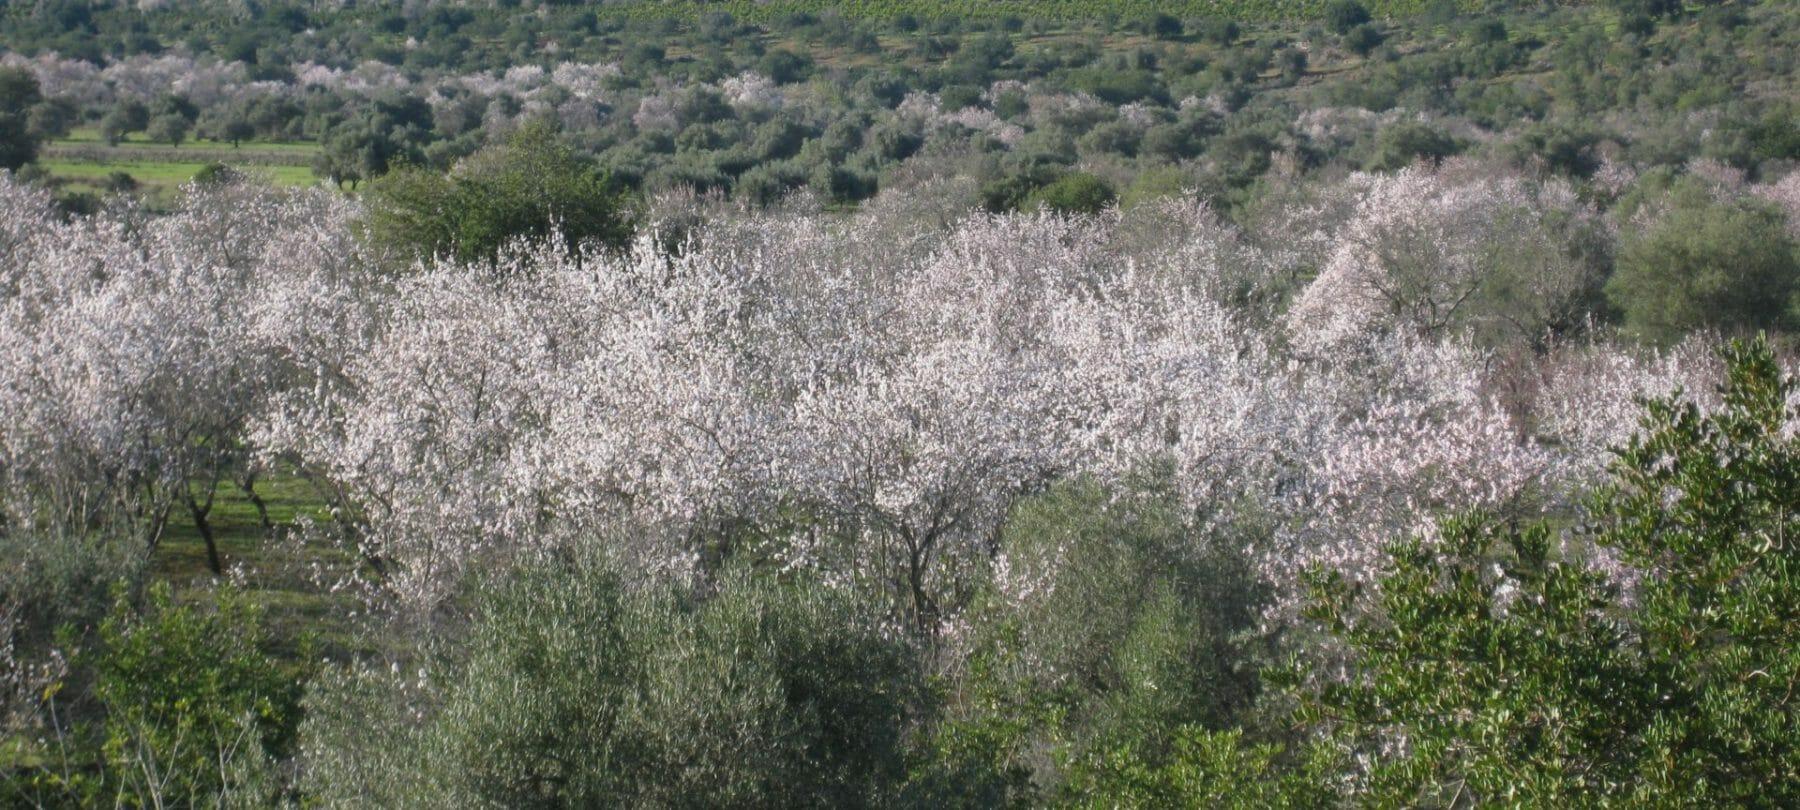 Yoga Woche - Mandelblüte an der Algarve